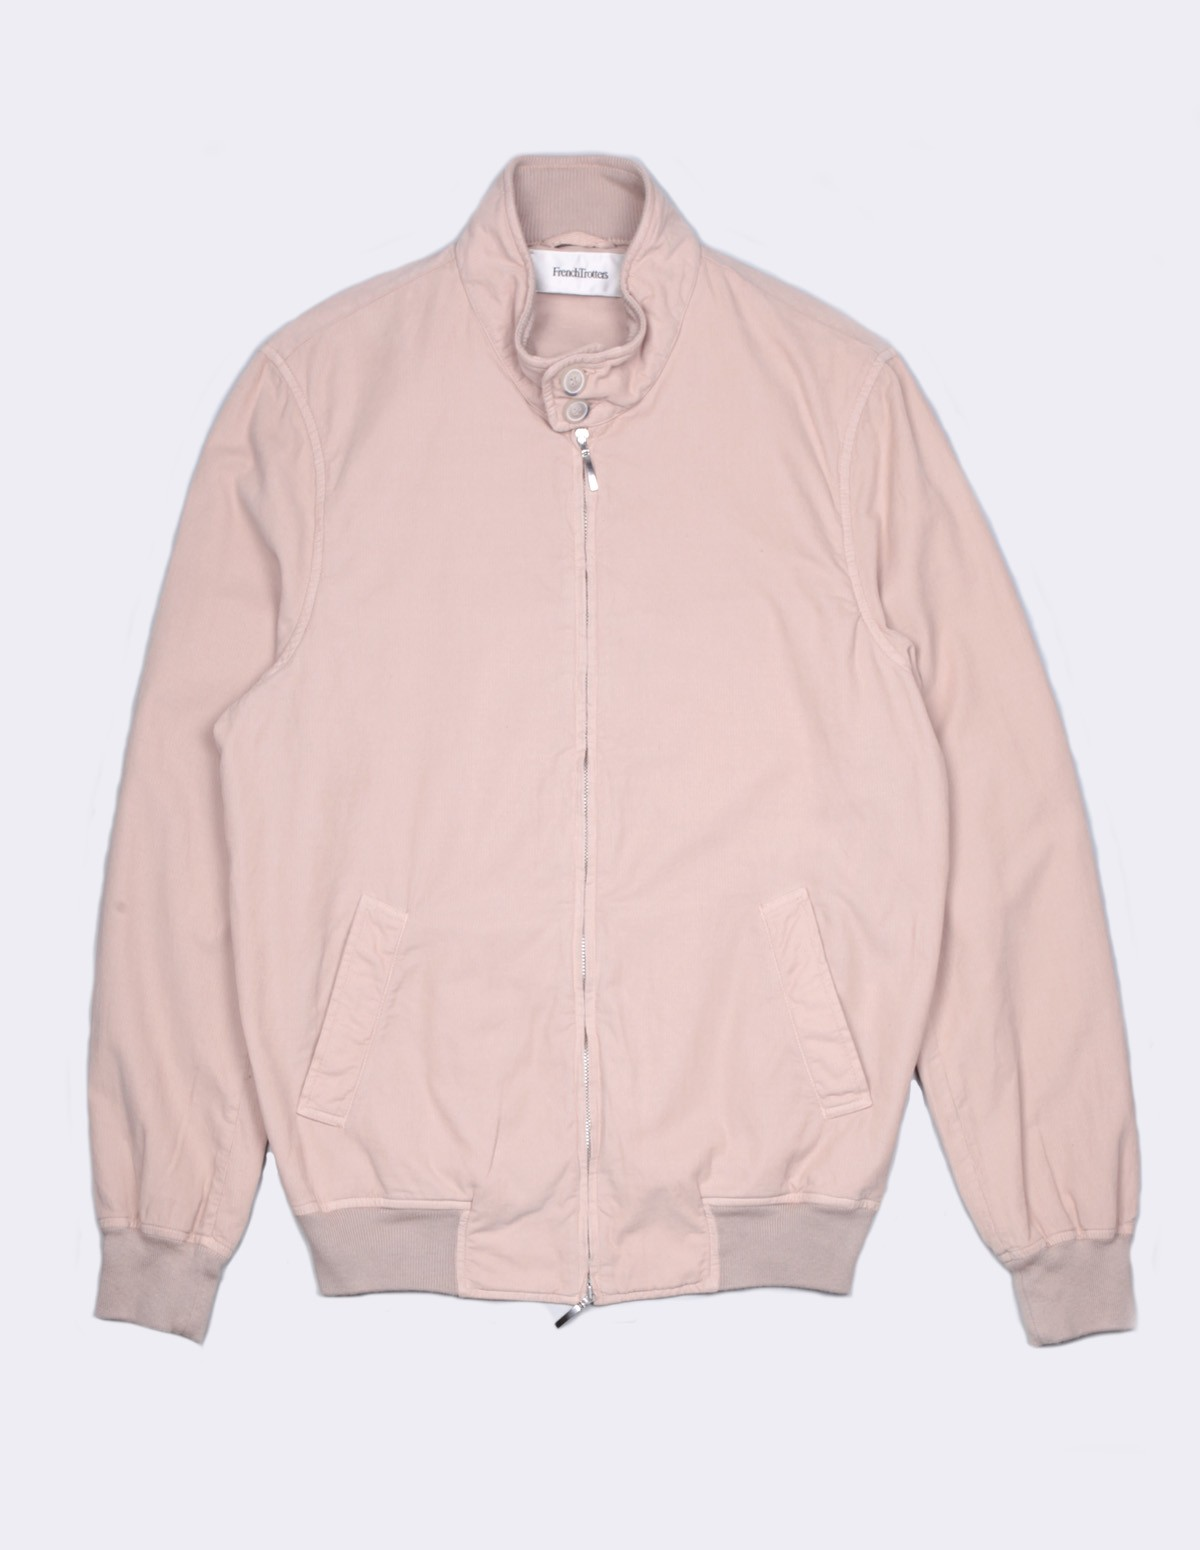 Ft Ft78194/50801 Jacket